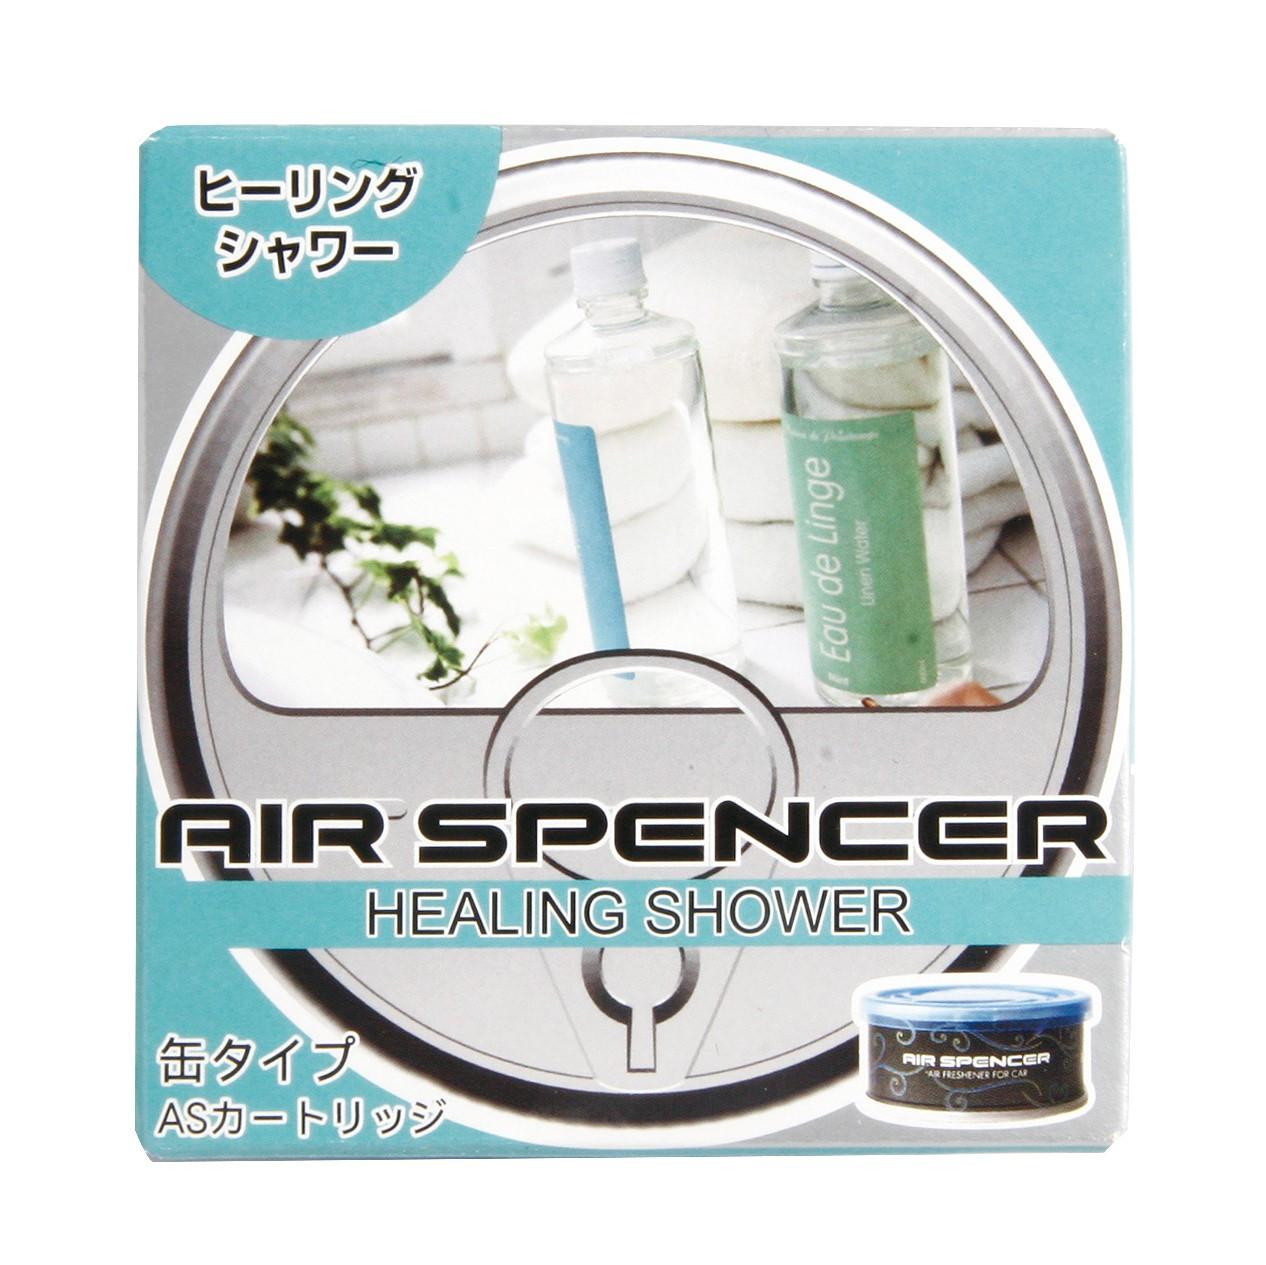 EIKOSHA AIR SPENCER HEALING SHOWER/исцеляющая влага